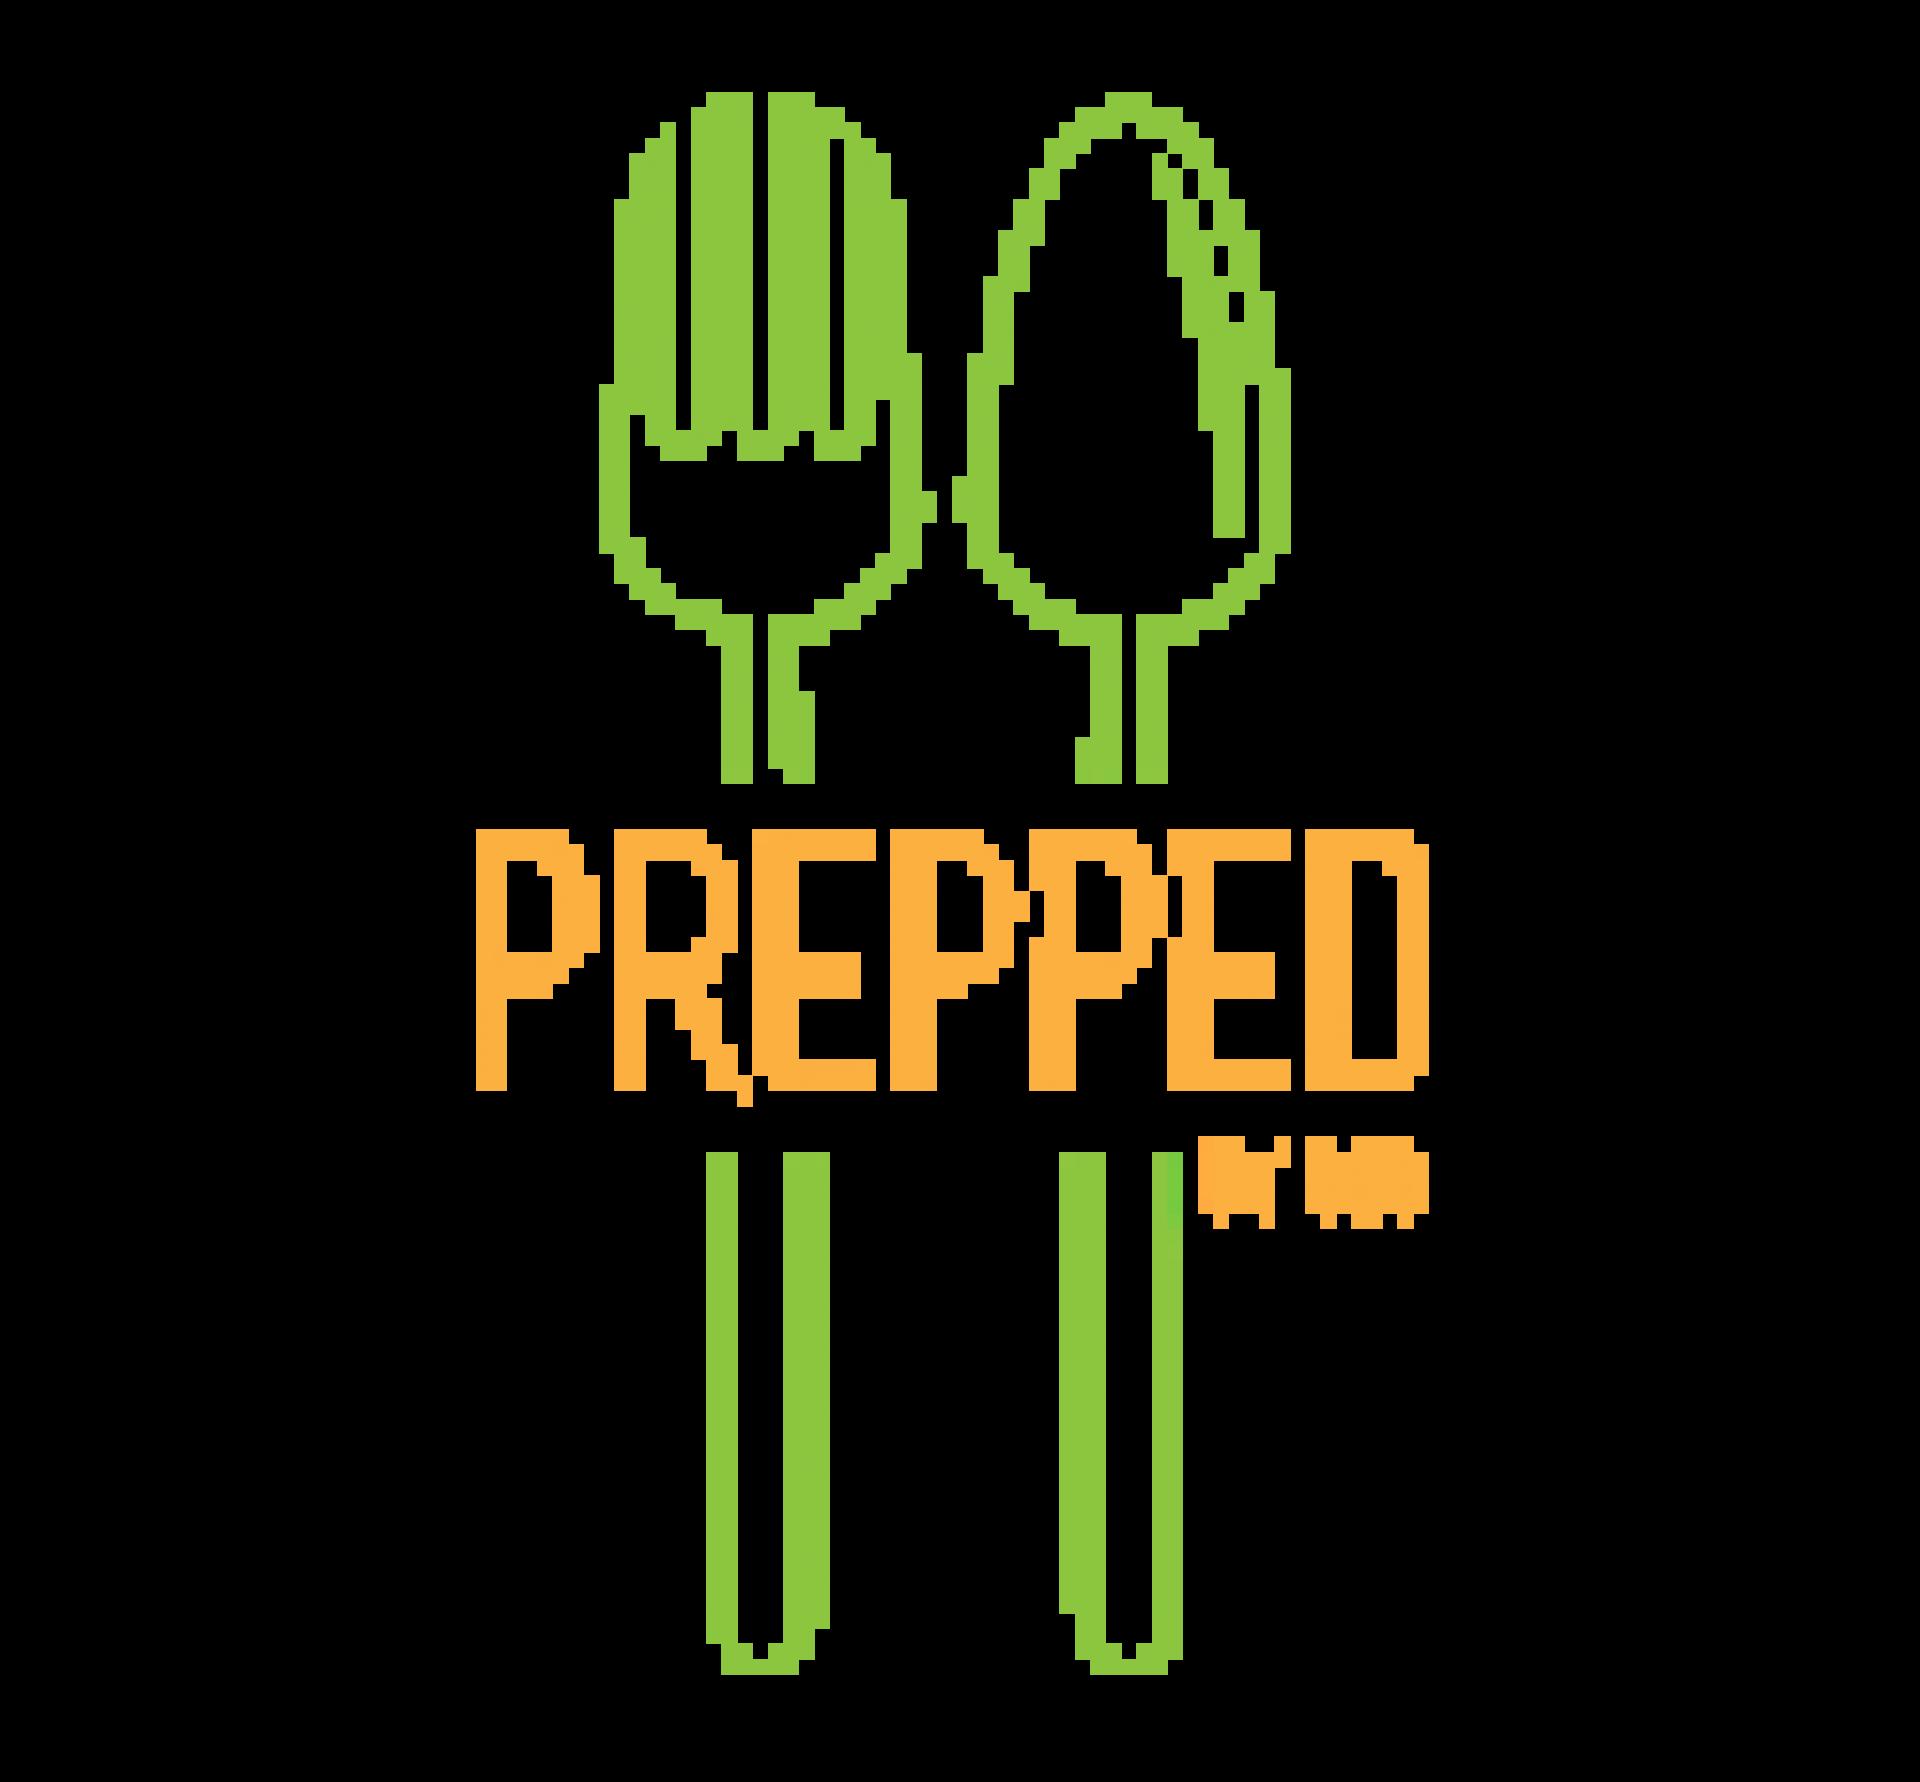 Prepped by Bec logo